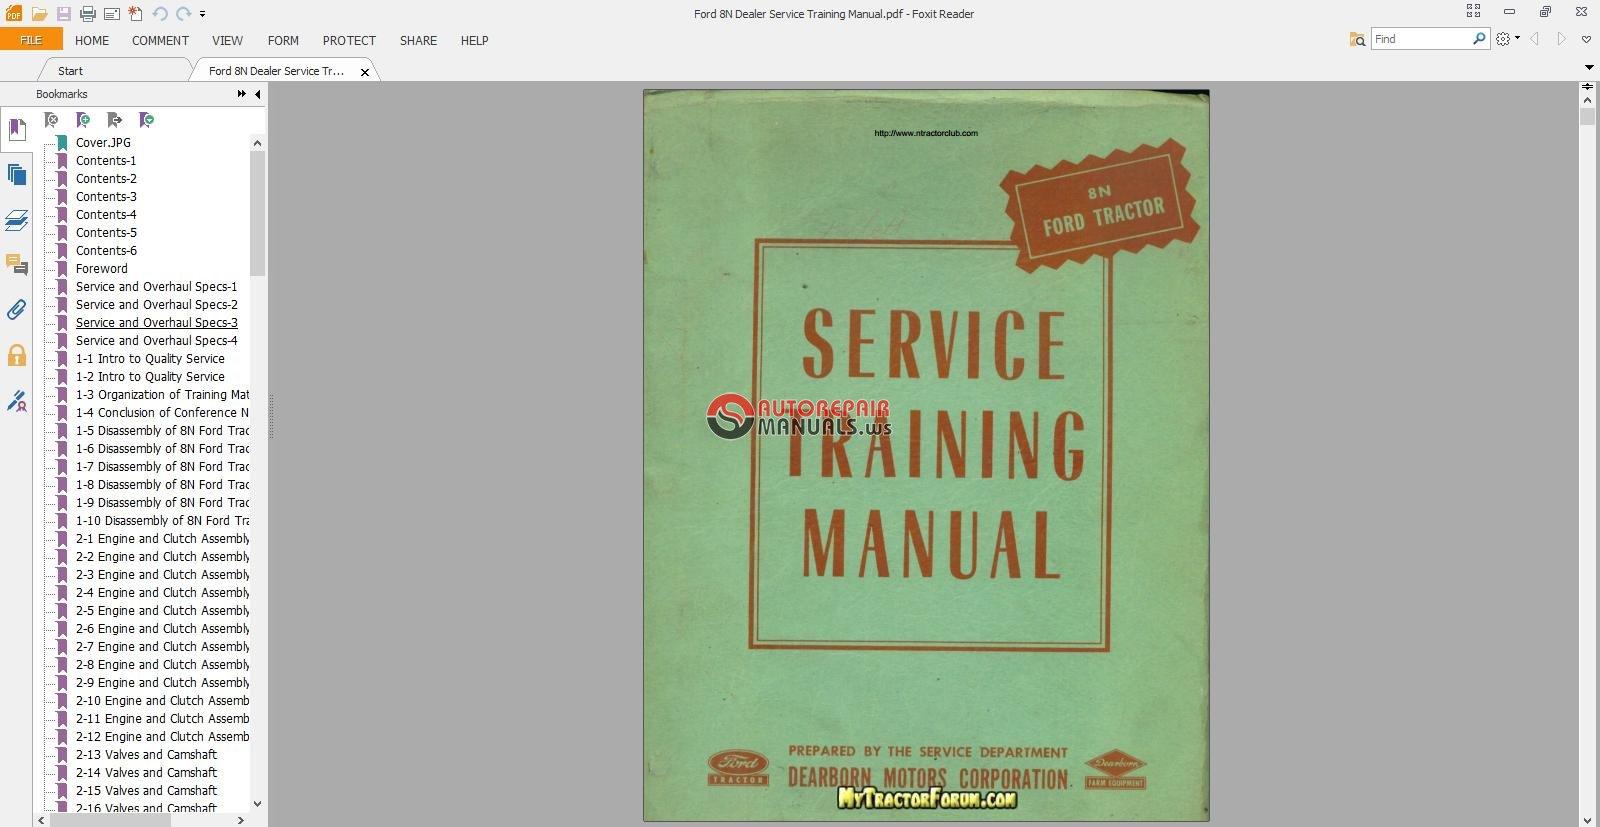 Ford 8n Dealer Service Training Manual Auto Repair Forum Pdf